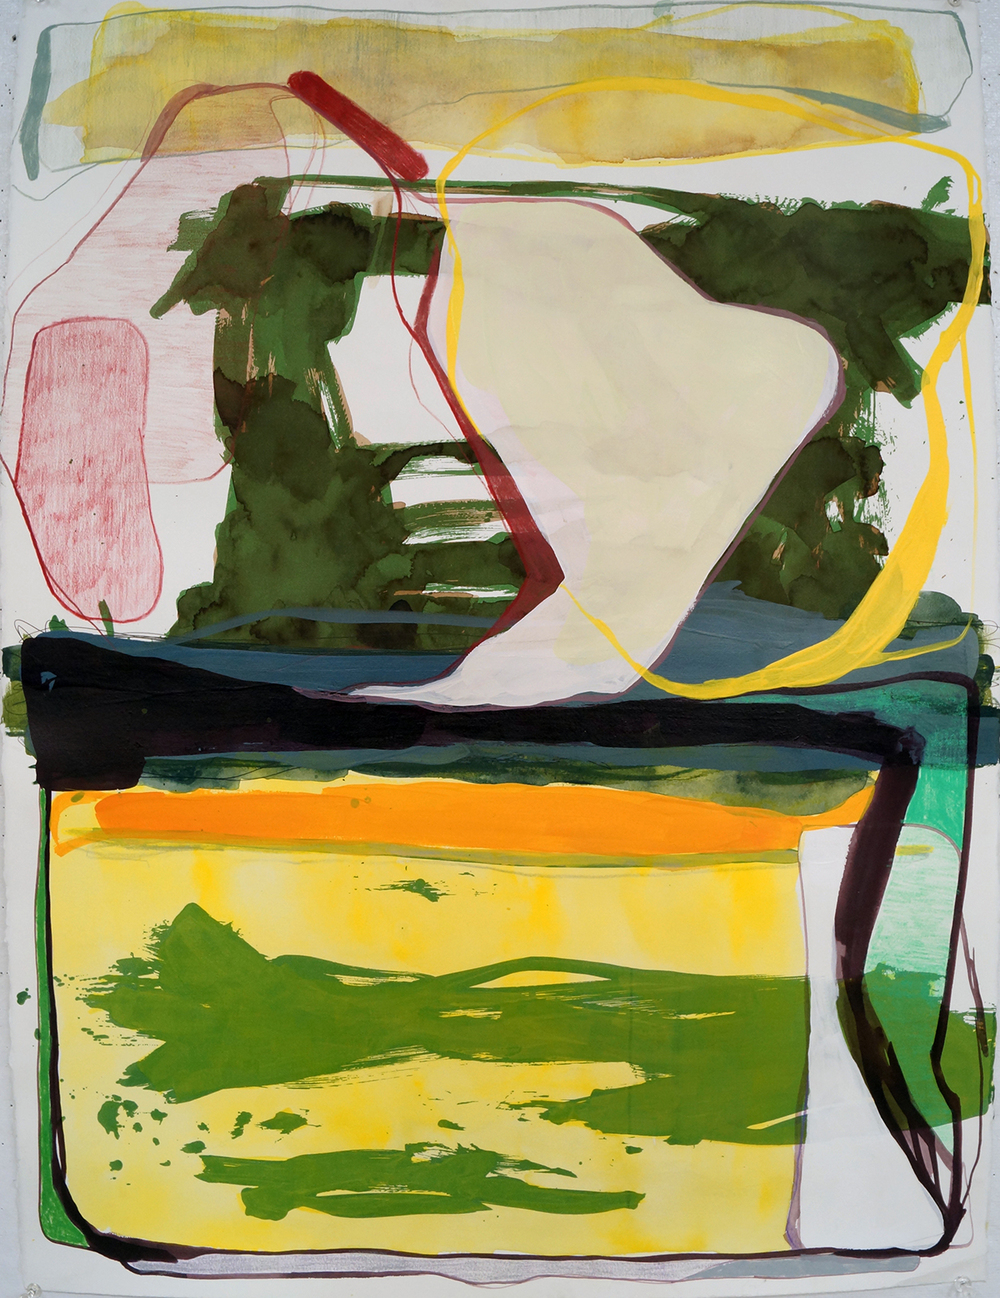 Untitled (9) - 2015